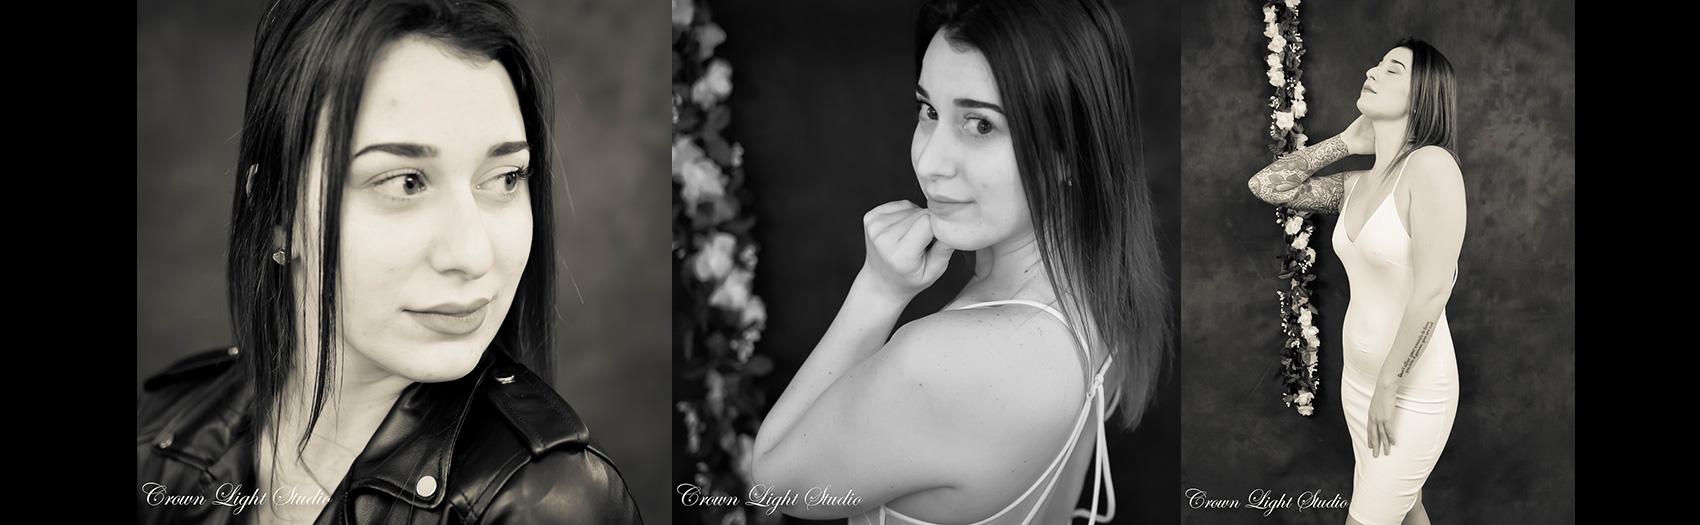 Crown Light Studio Portrait and Model Photography